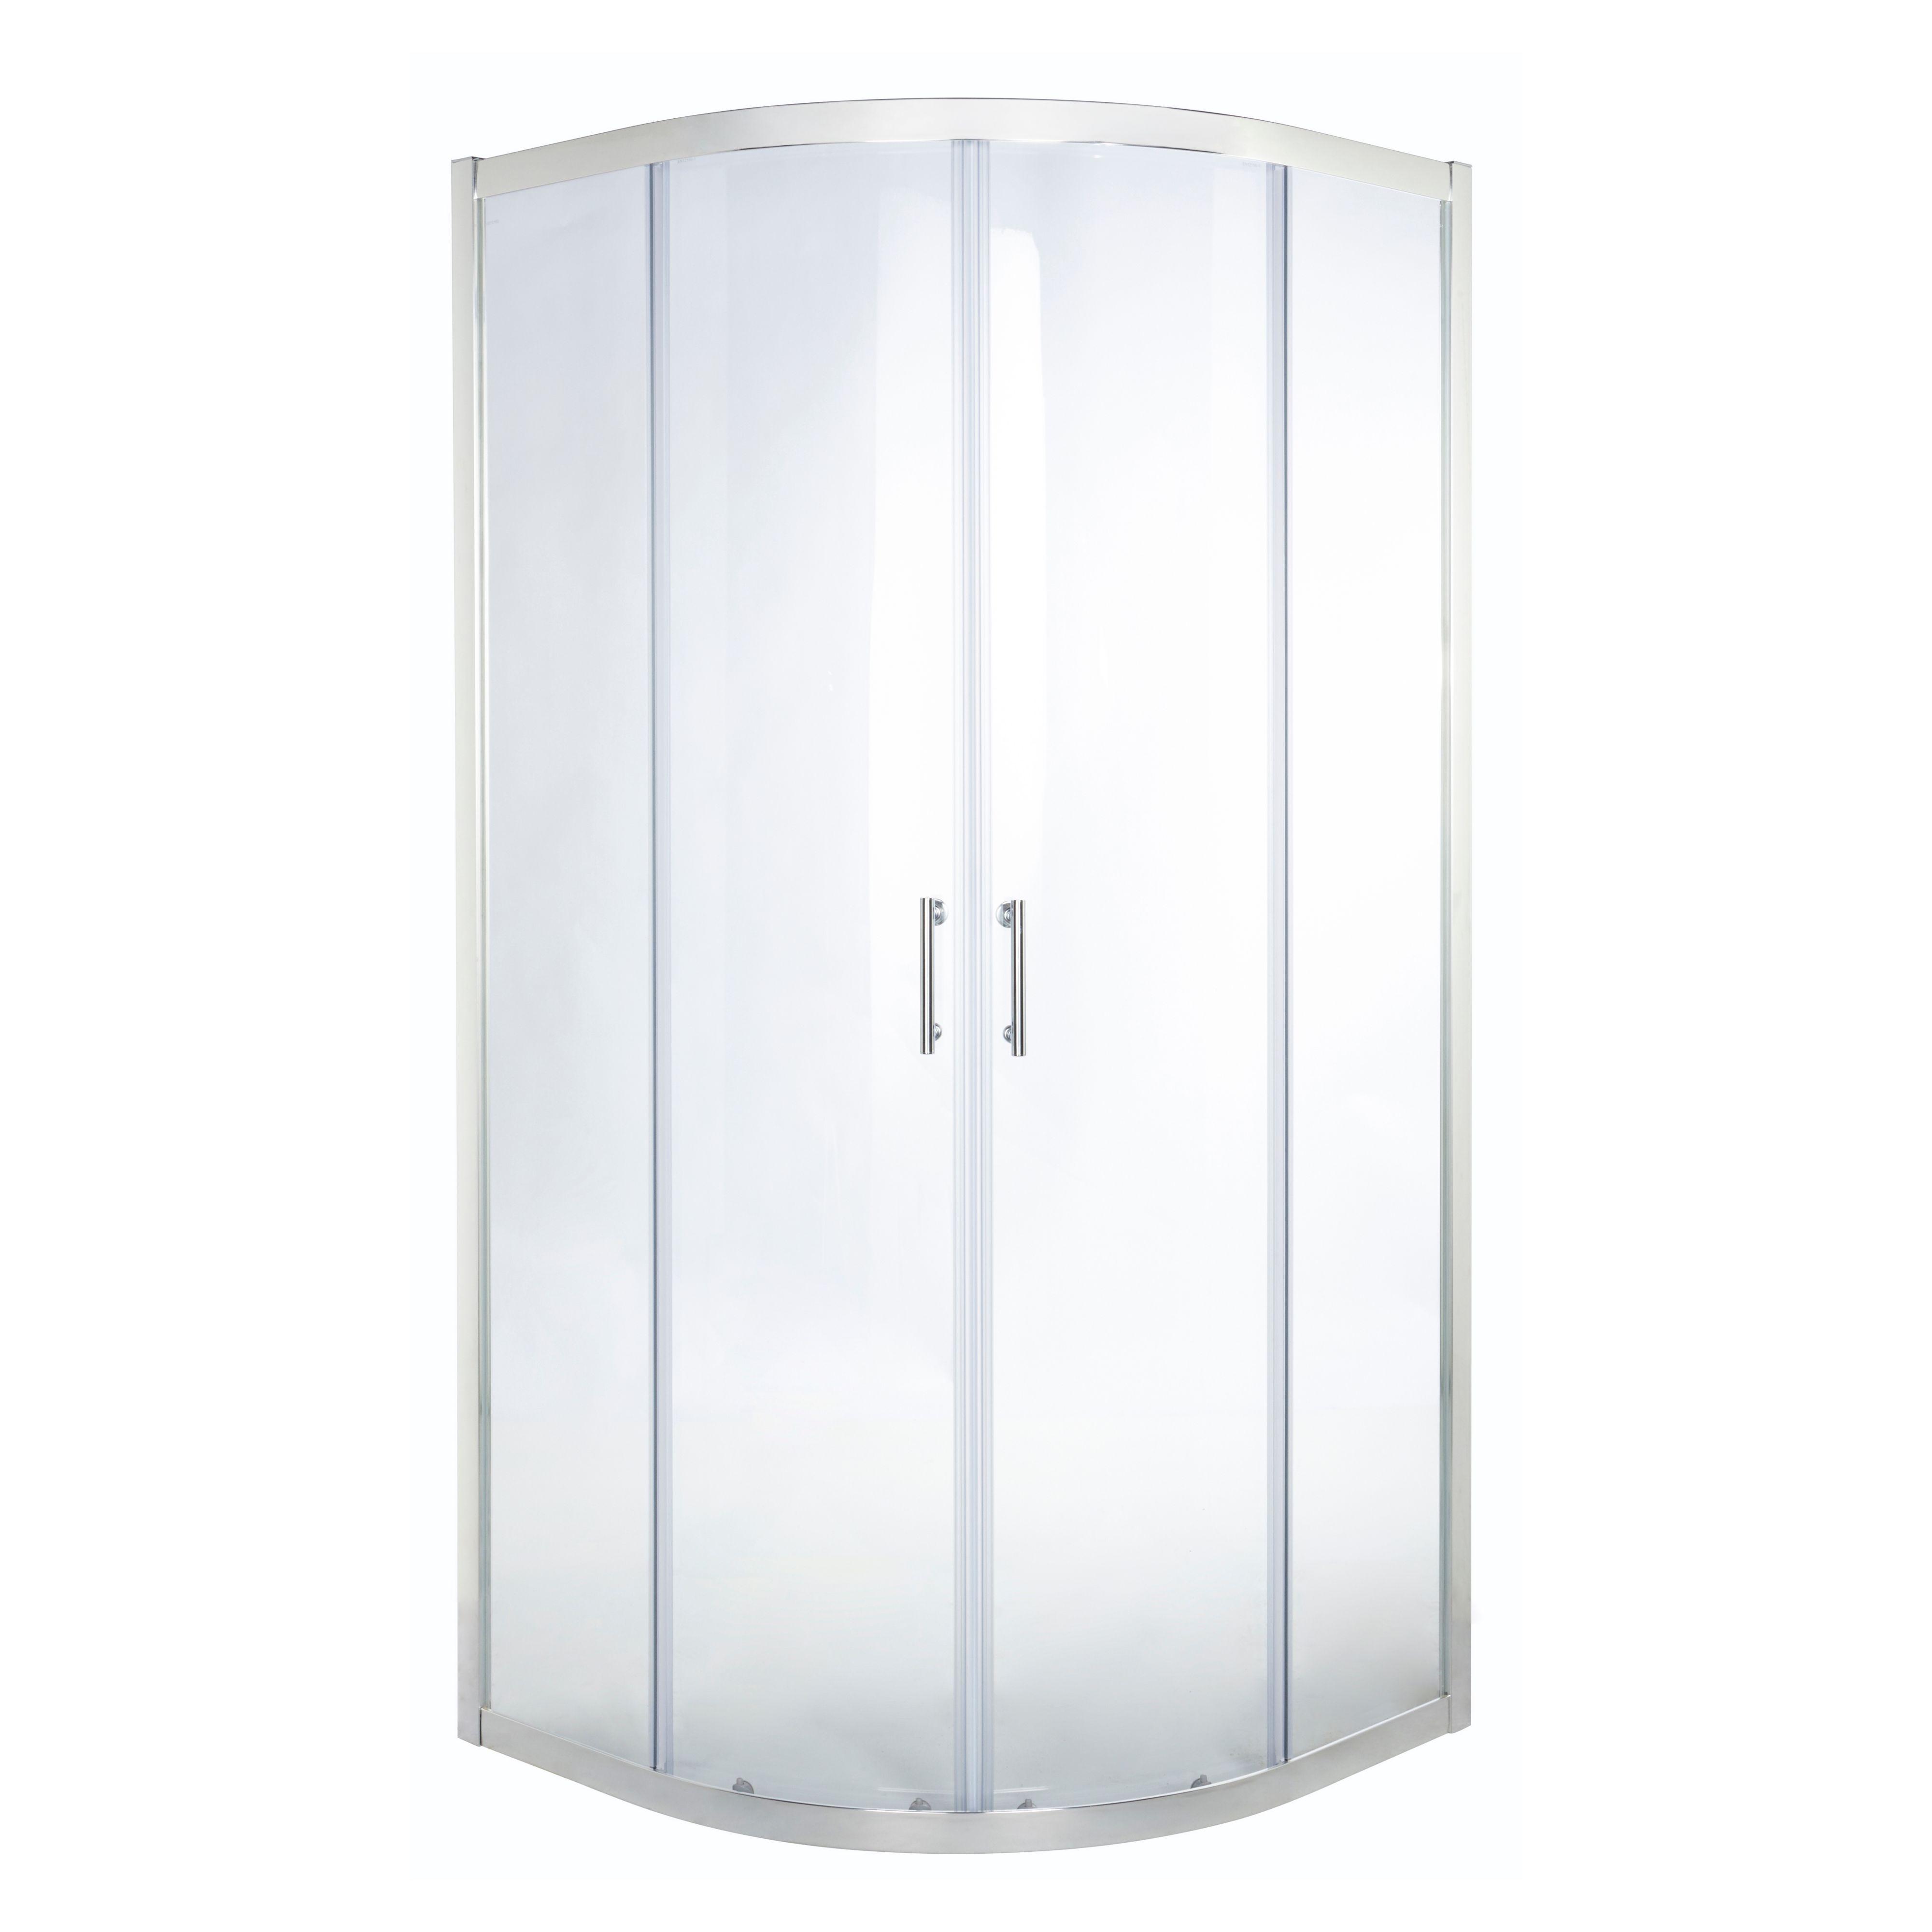 Cooke & Lewis Onega Quadrant Shower enclosure with Corner entry ...